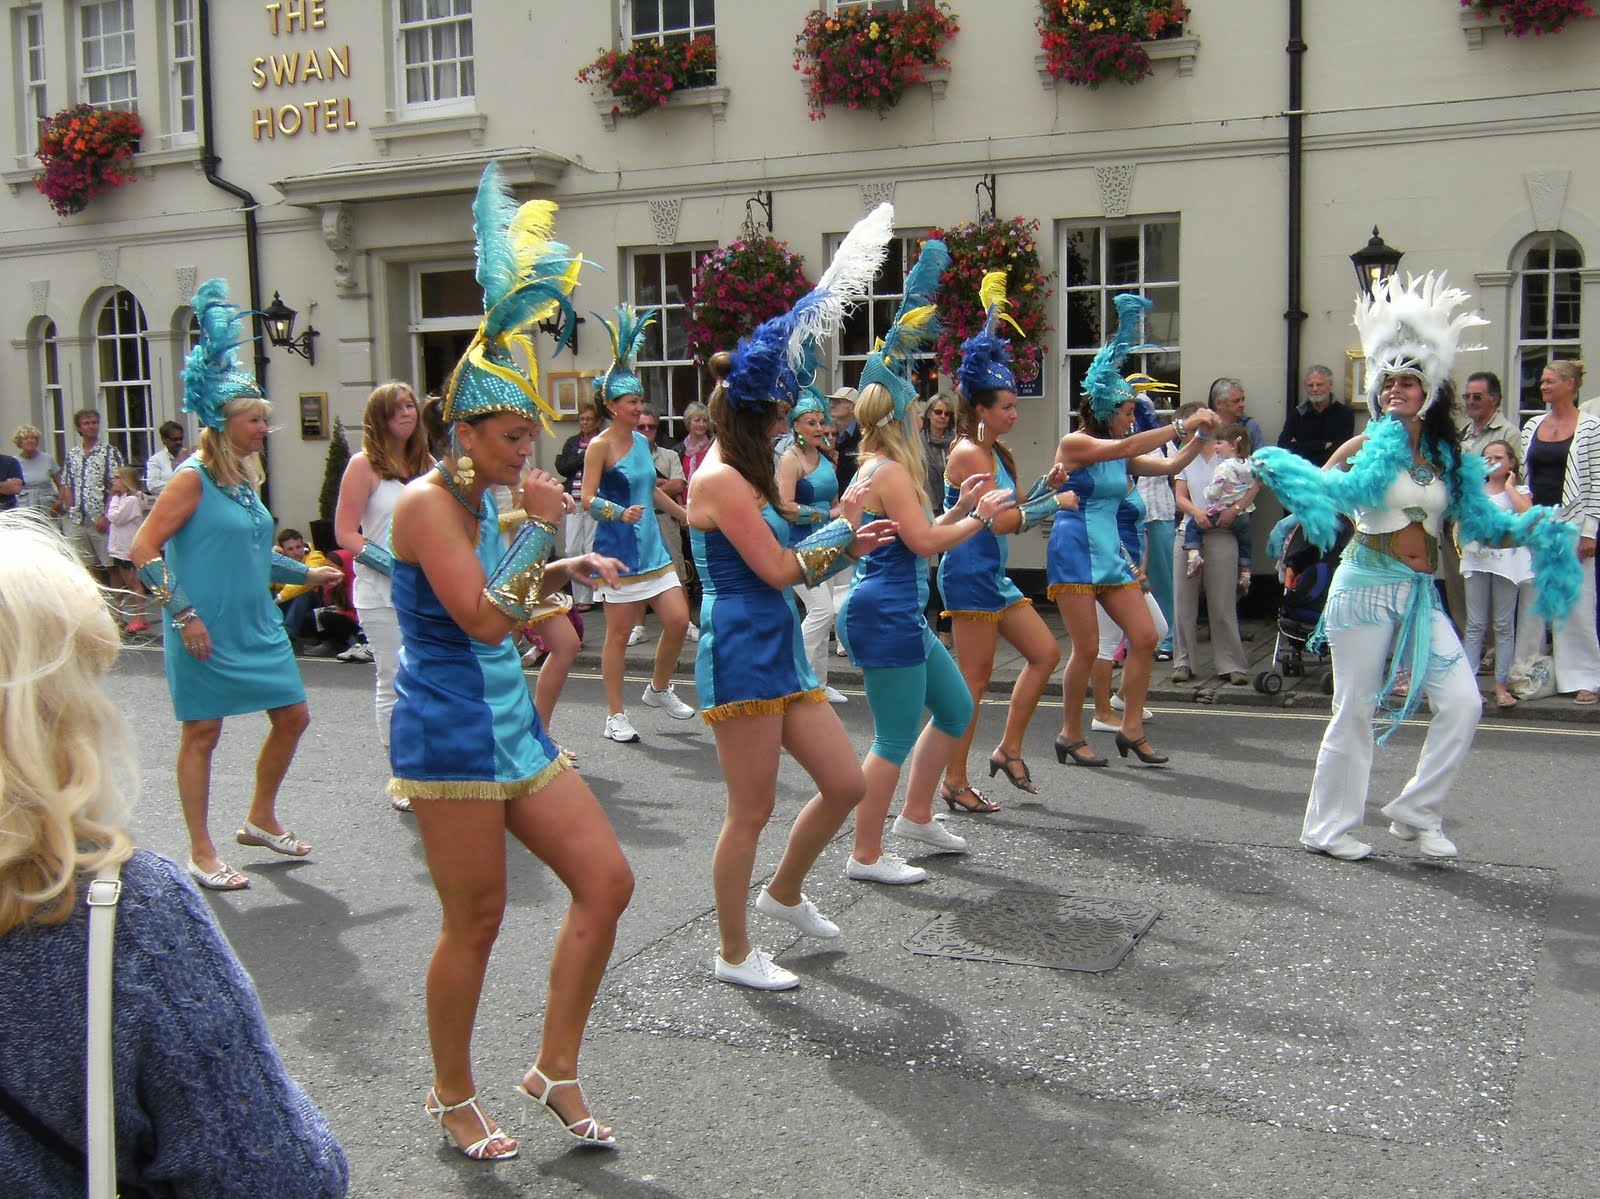 1008290005 The Brighton School of Samba at the 2010 Arundel Festival